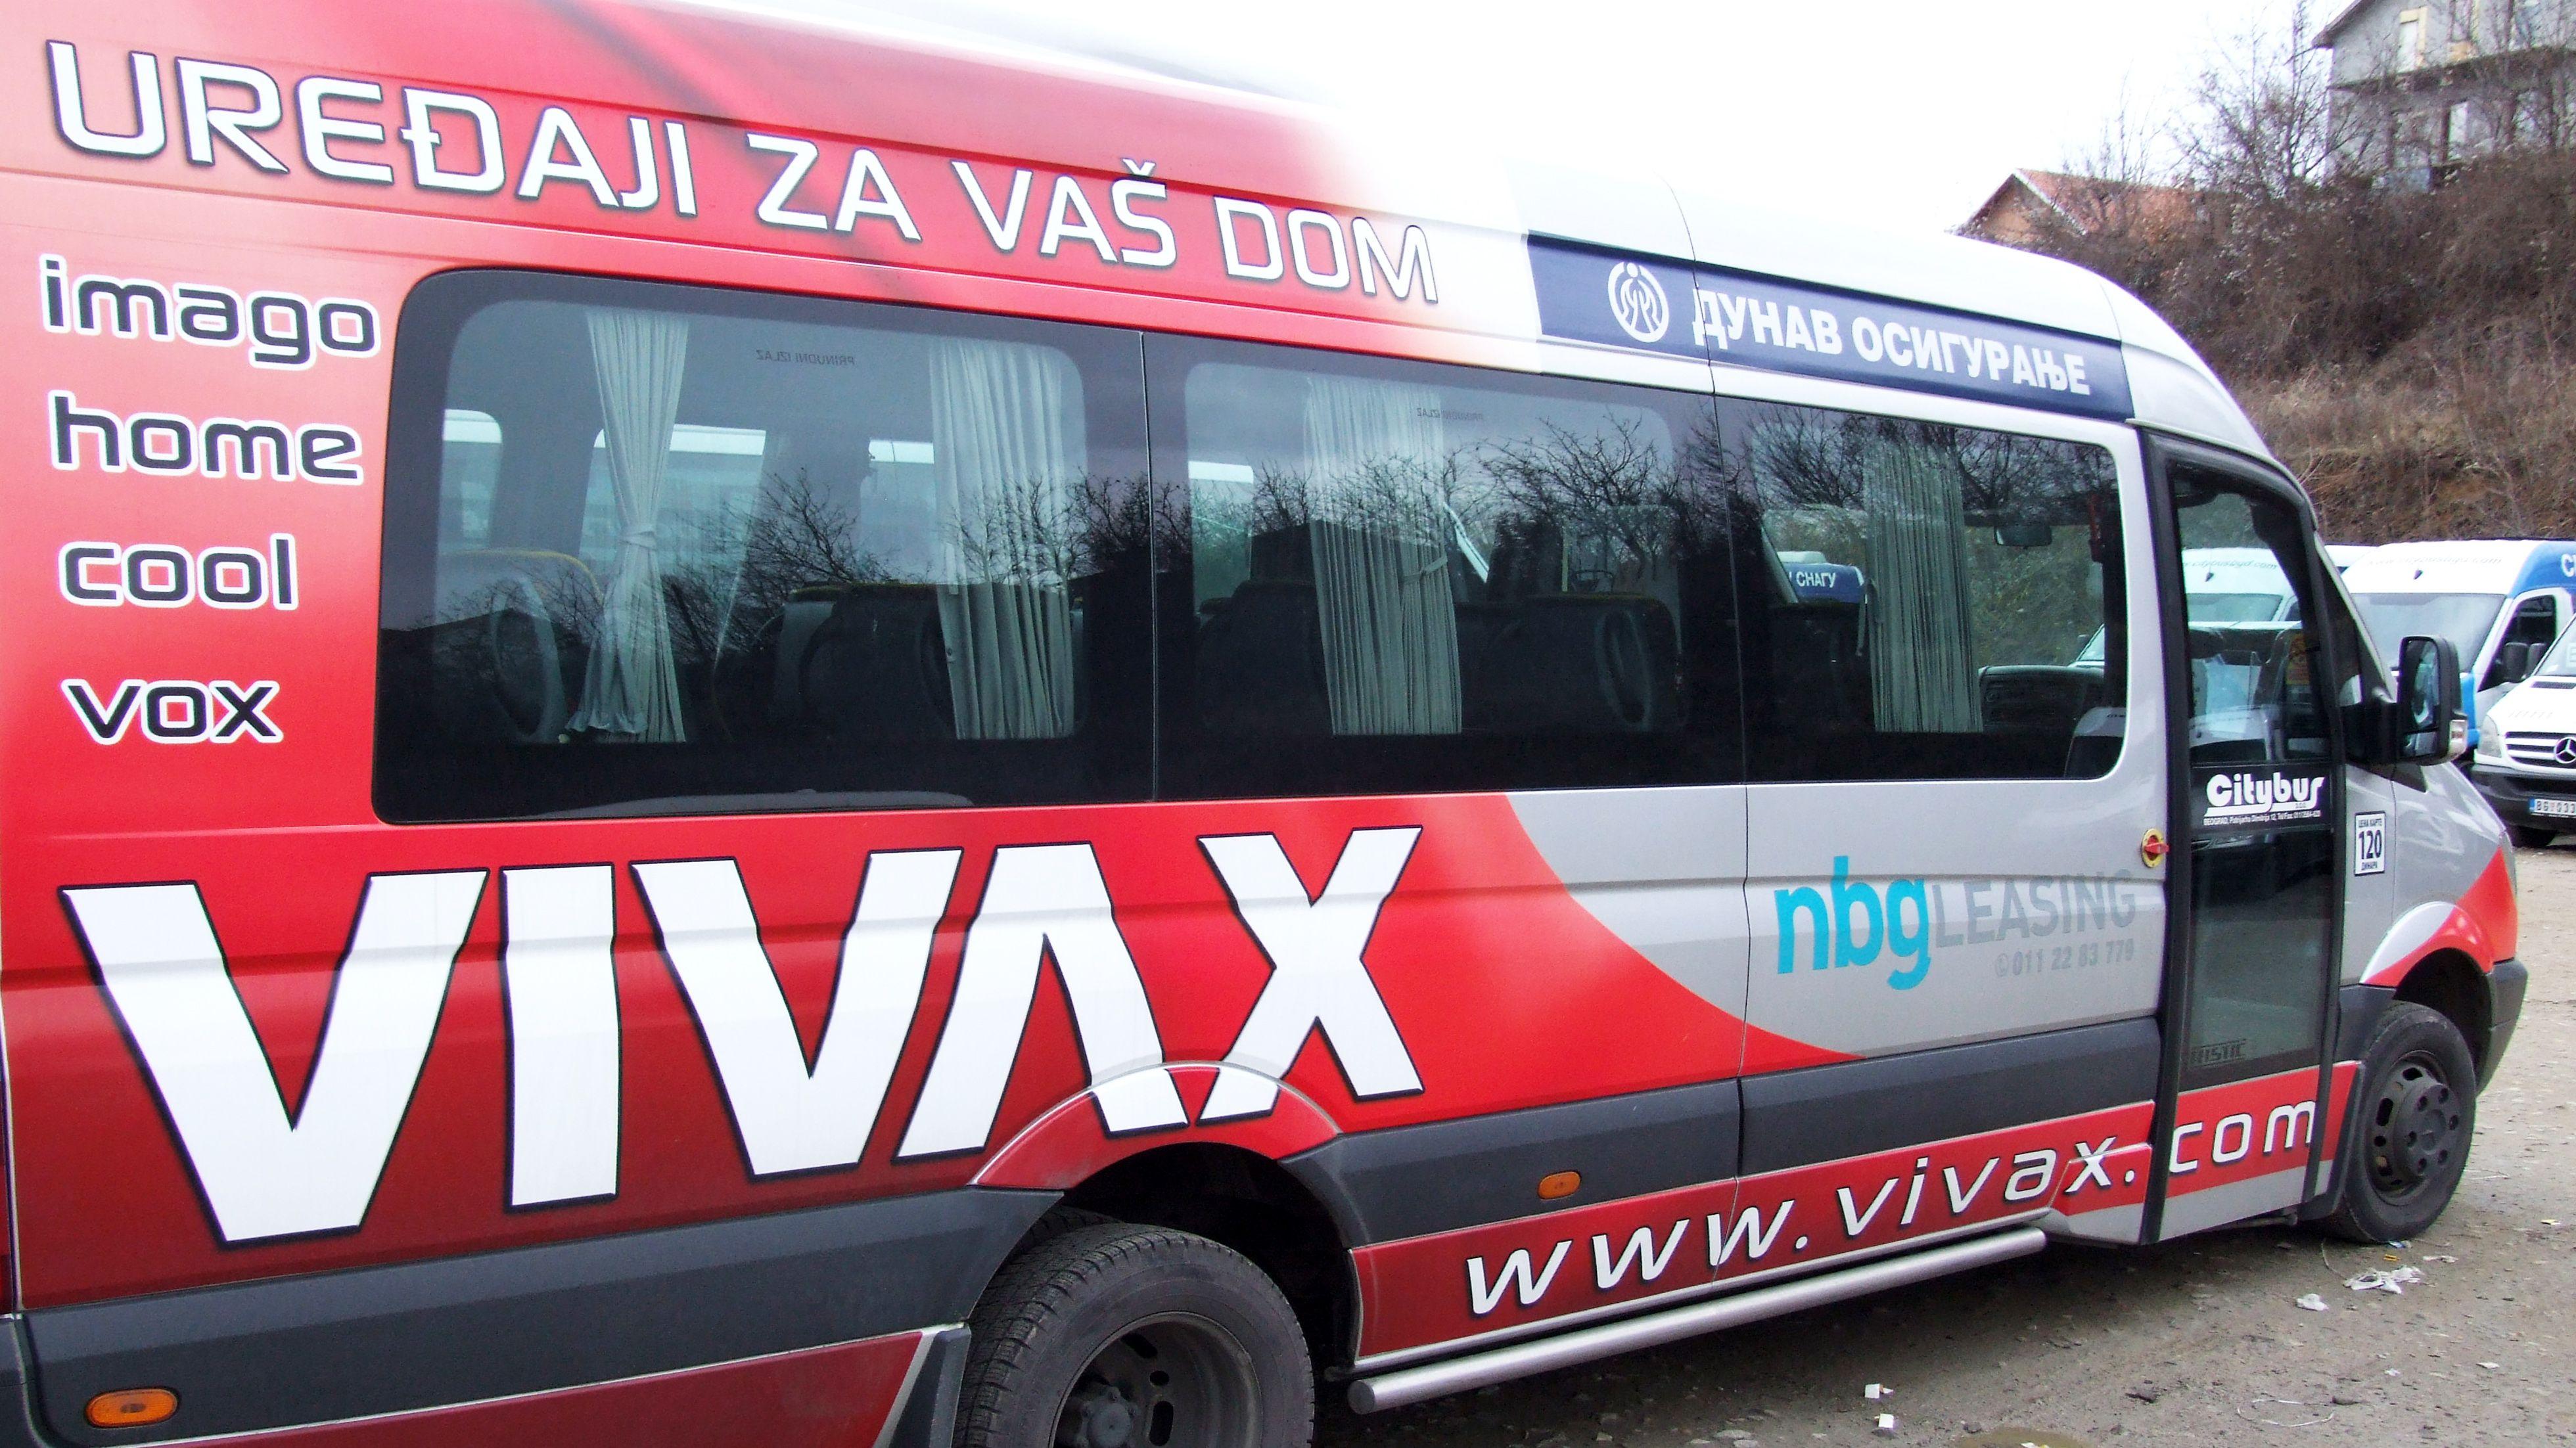 Brendiranje vozila i poslovnih prostora Pacarti studio Beograd Srbija Vivax